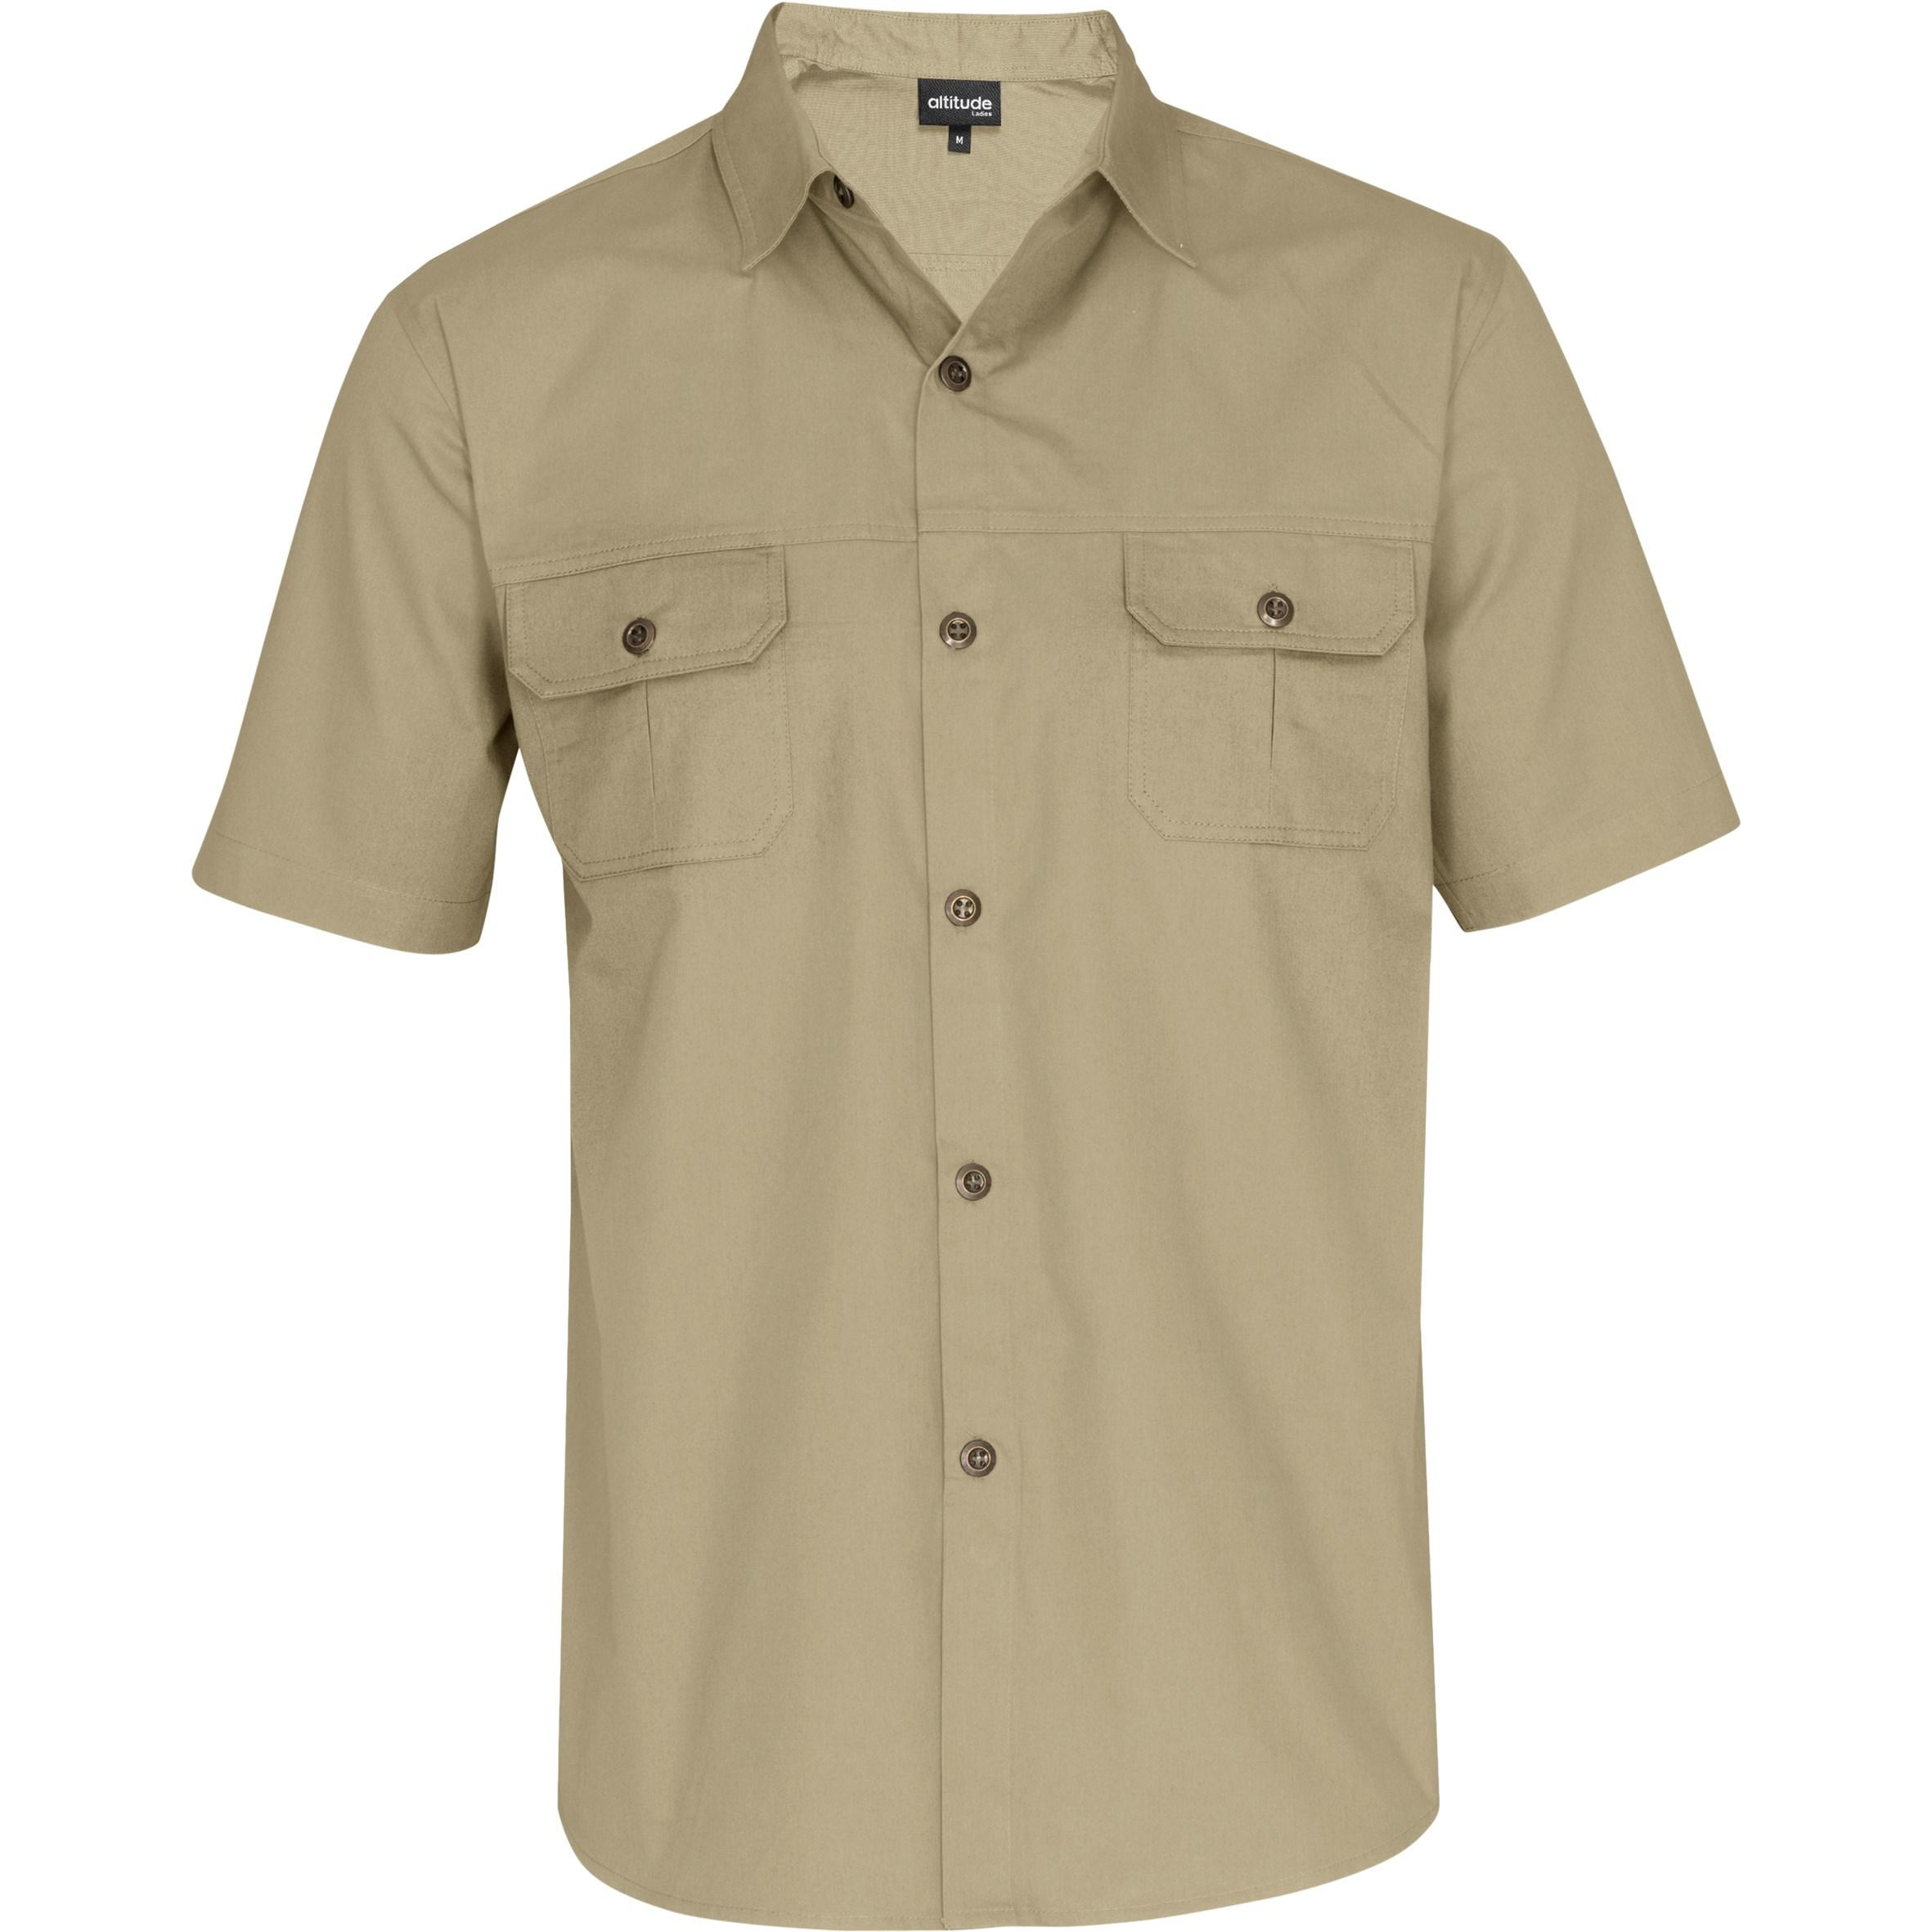 Mens Short Sleeve Oryx Bush Shirt - Stone Only